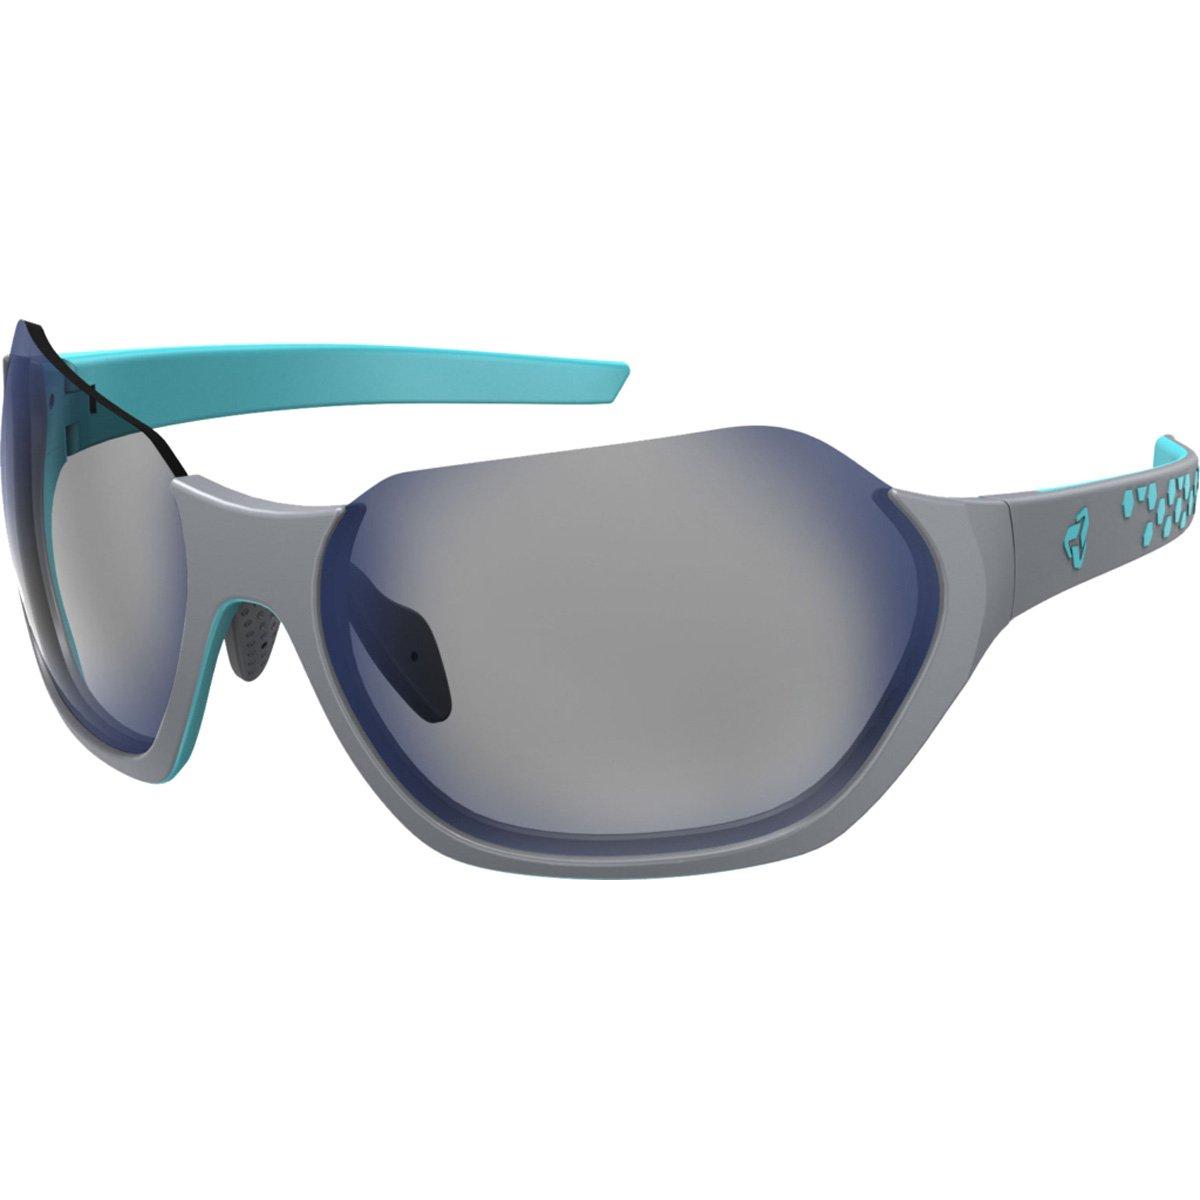 Ryders Eyewear Flyp Fyre Antifogサングラス One Size グレー - ブルー B071VKYJL6